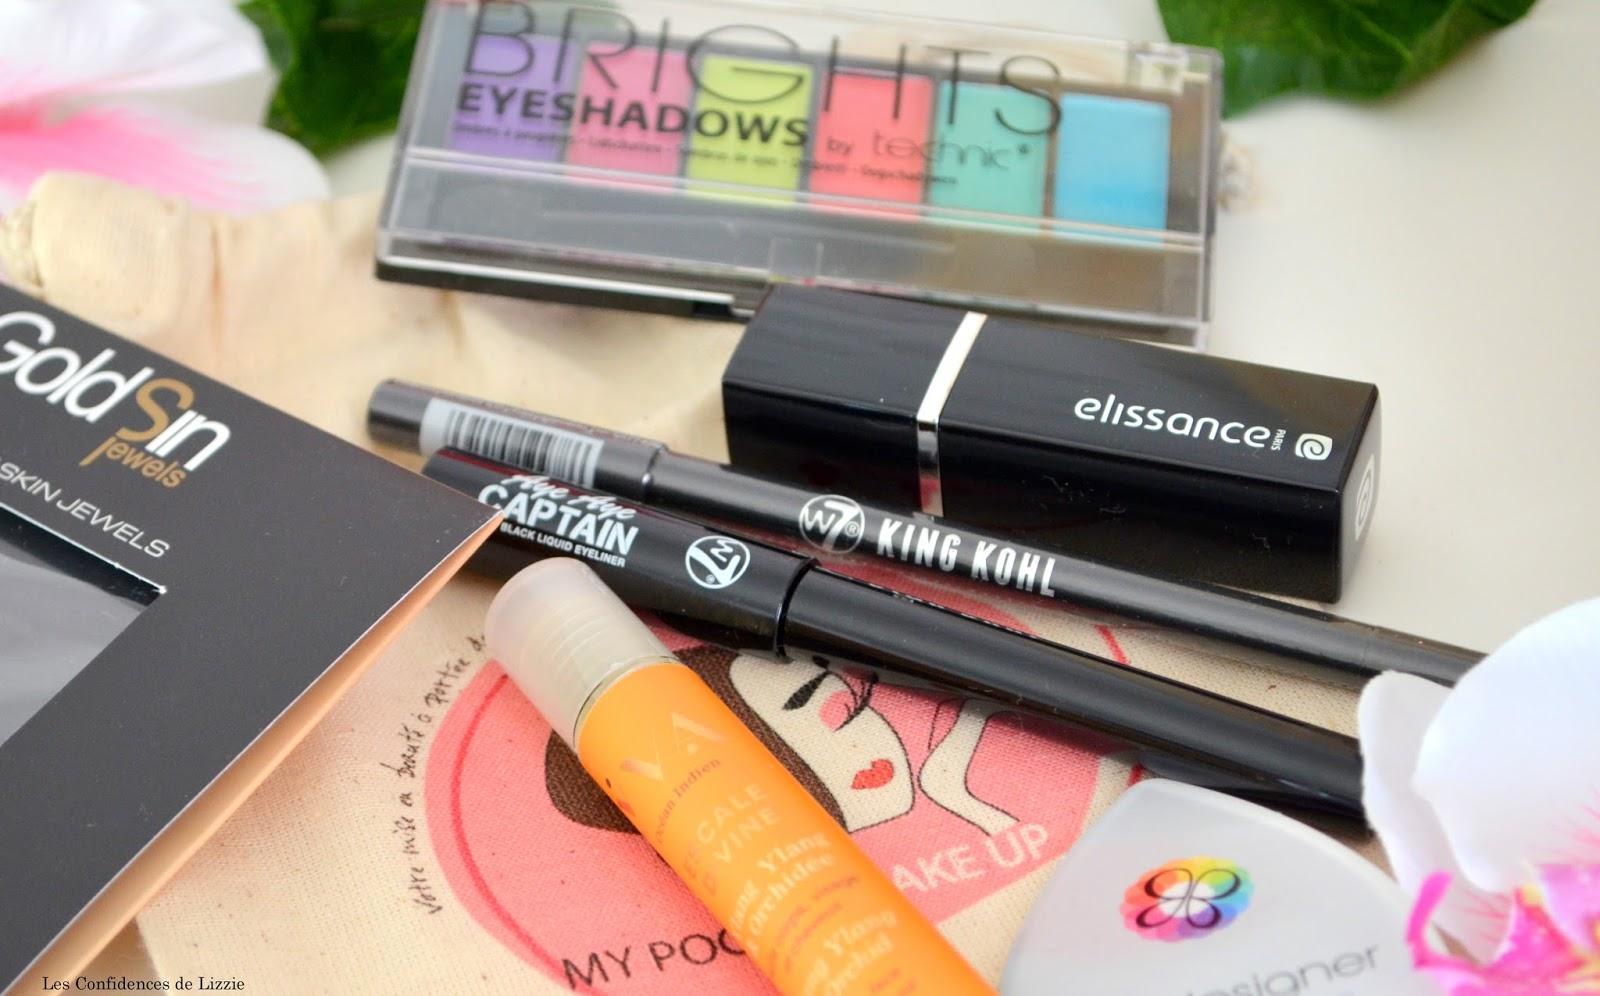 box - maquillage - box pas chere - box avec abonnement - box sans abonnement - box maquillage sans abonnement - box maquillage accessible